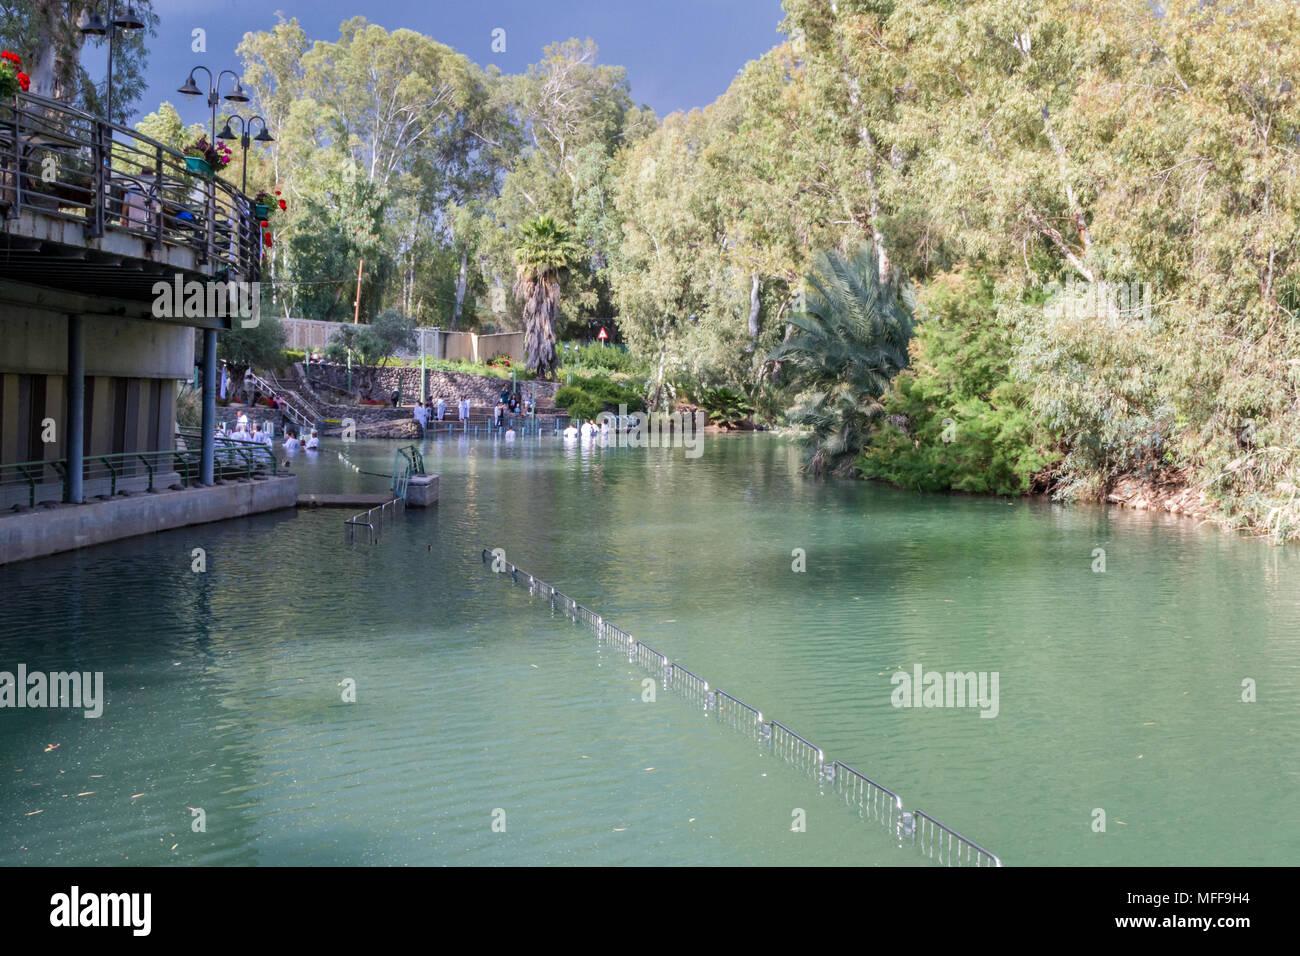 Shores of Jordan River at Baptismal Site, Israel Stock Photo